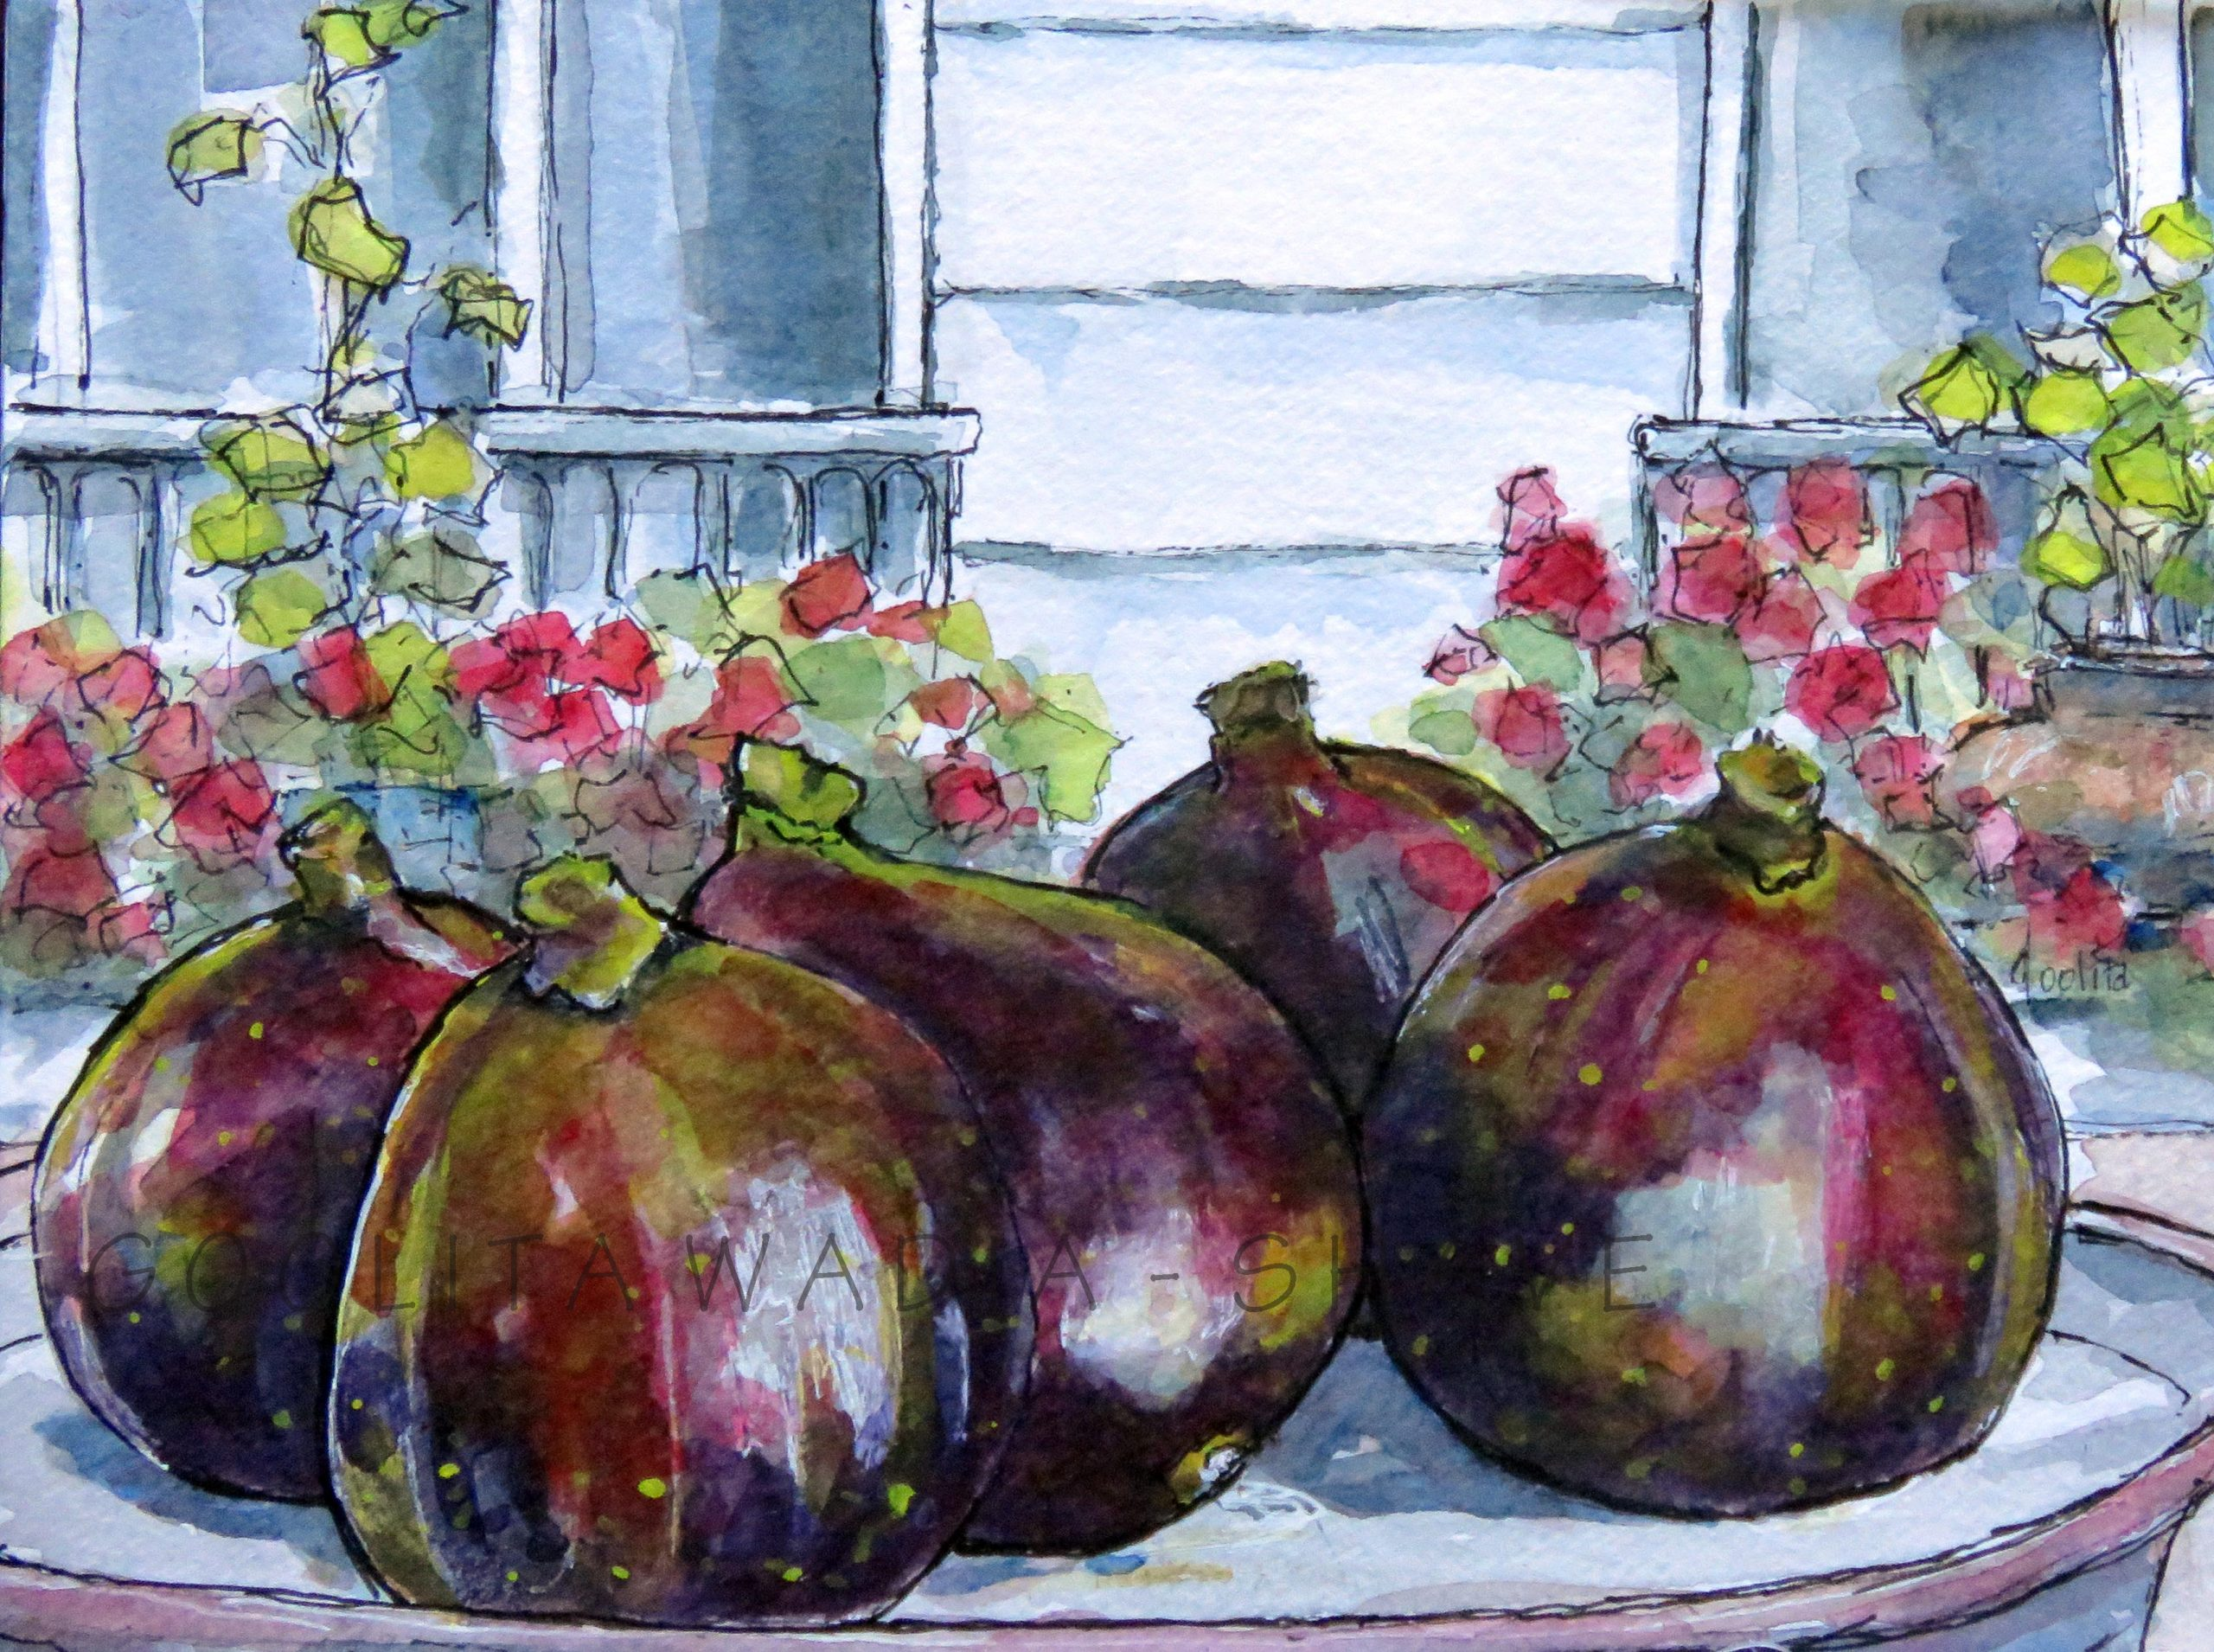 "Love Figs - 6"" x 8"" - Original Watercolour on Archival Paper. Prints 8"" x10"" $45"